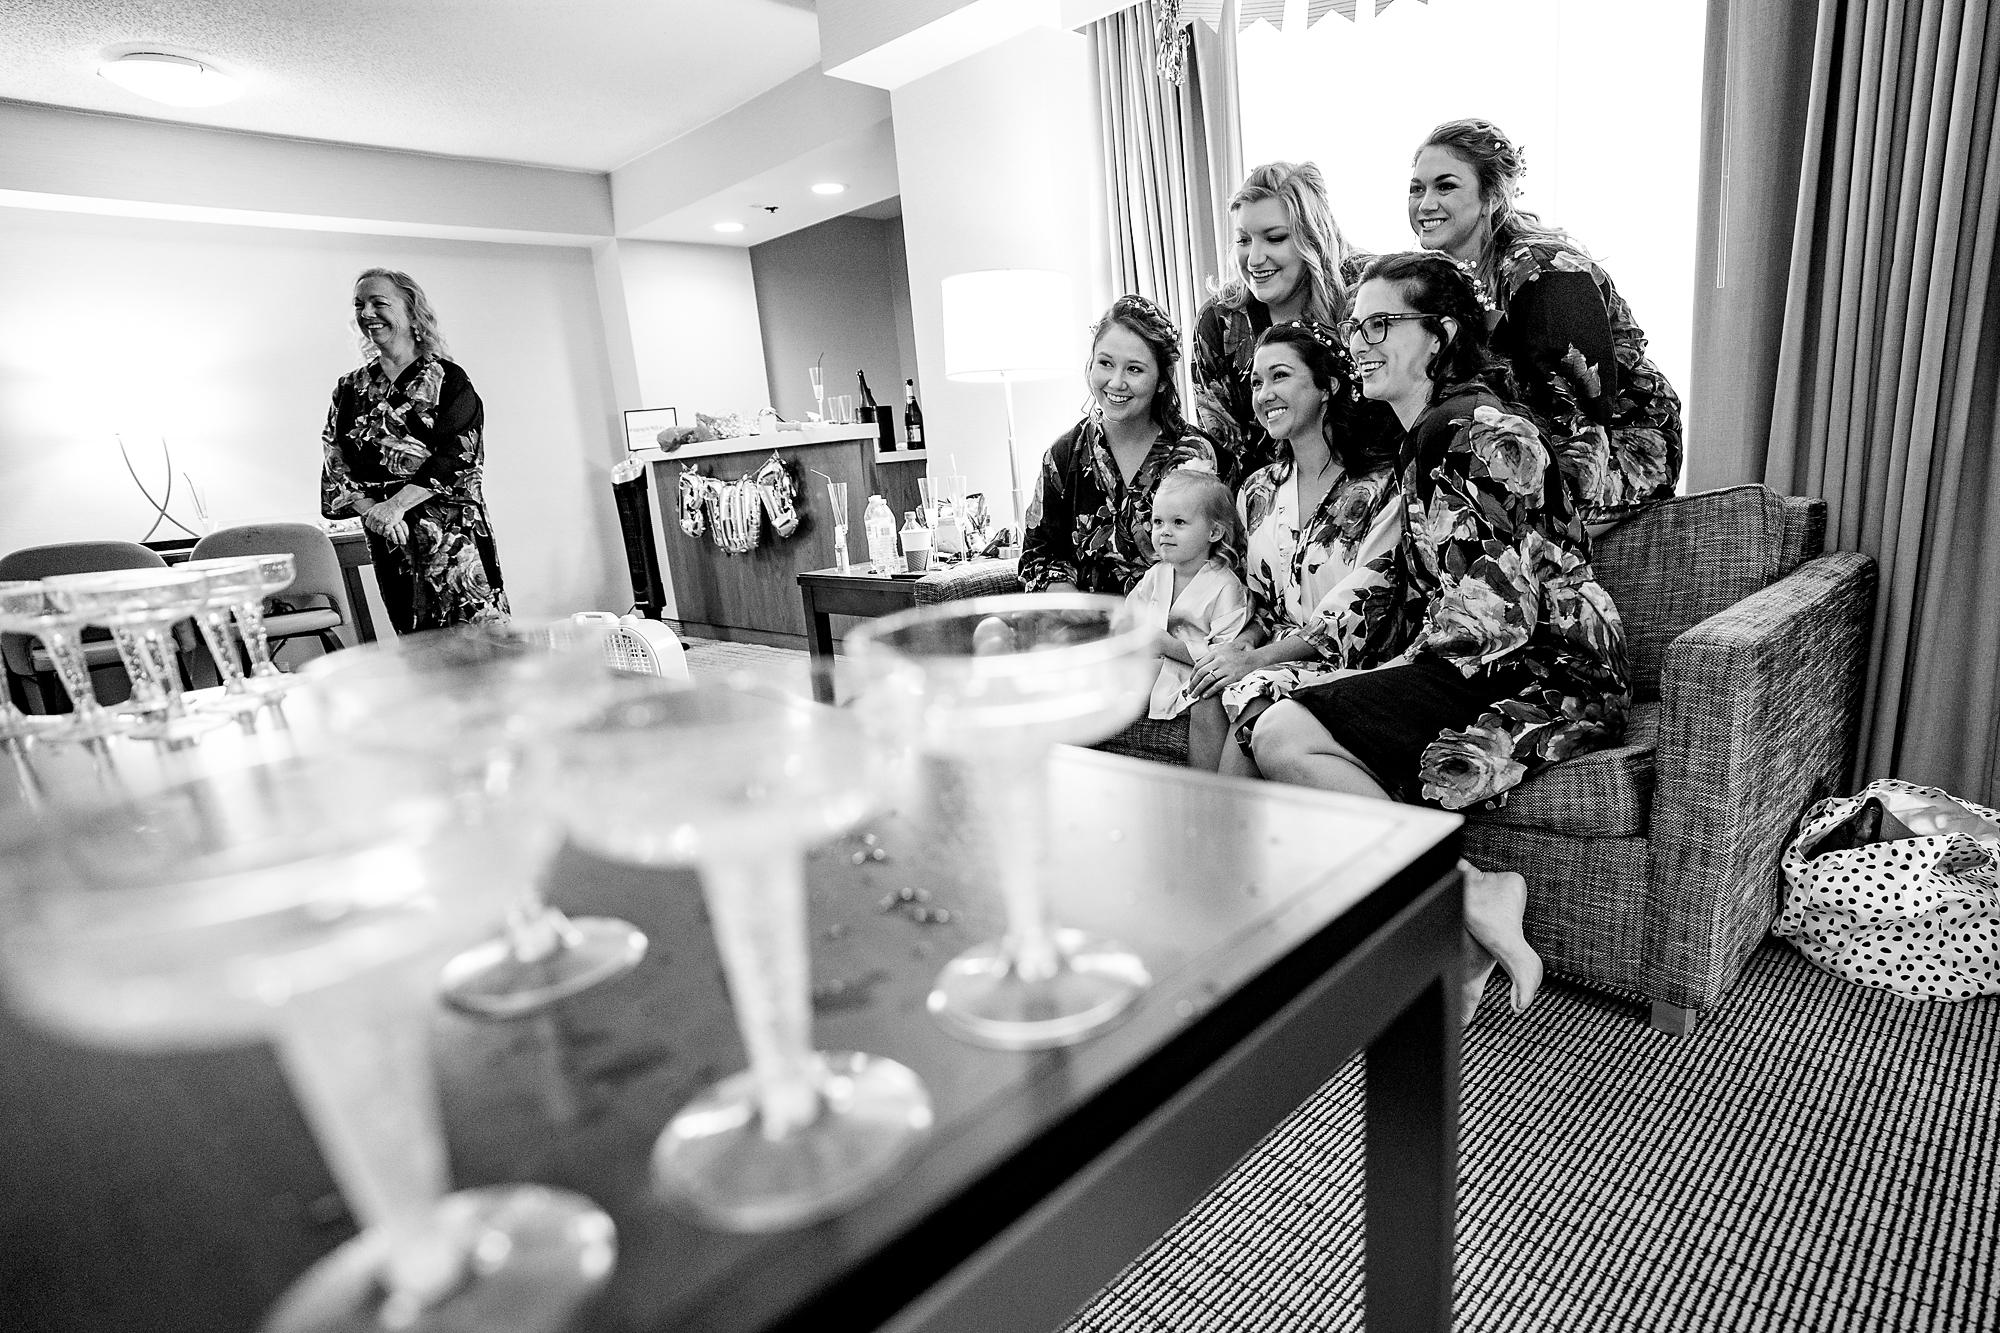 Embassy-Suites-Rivercenter-Wedding-Photography-2.jpg